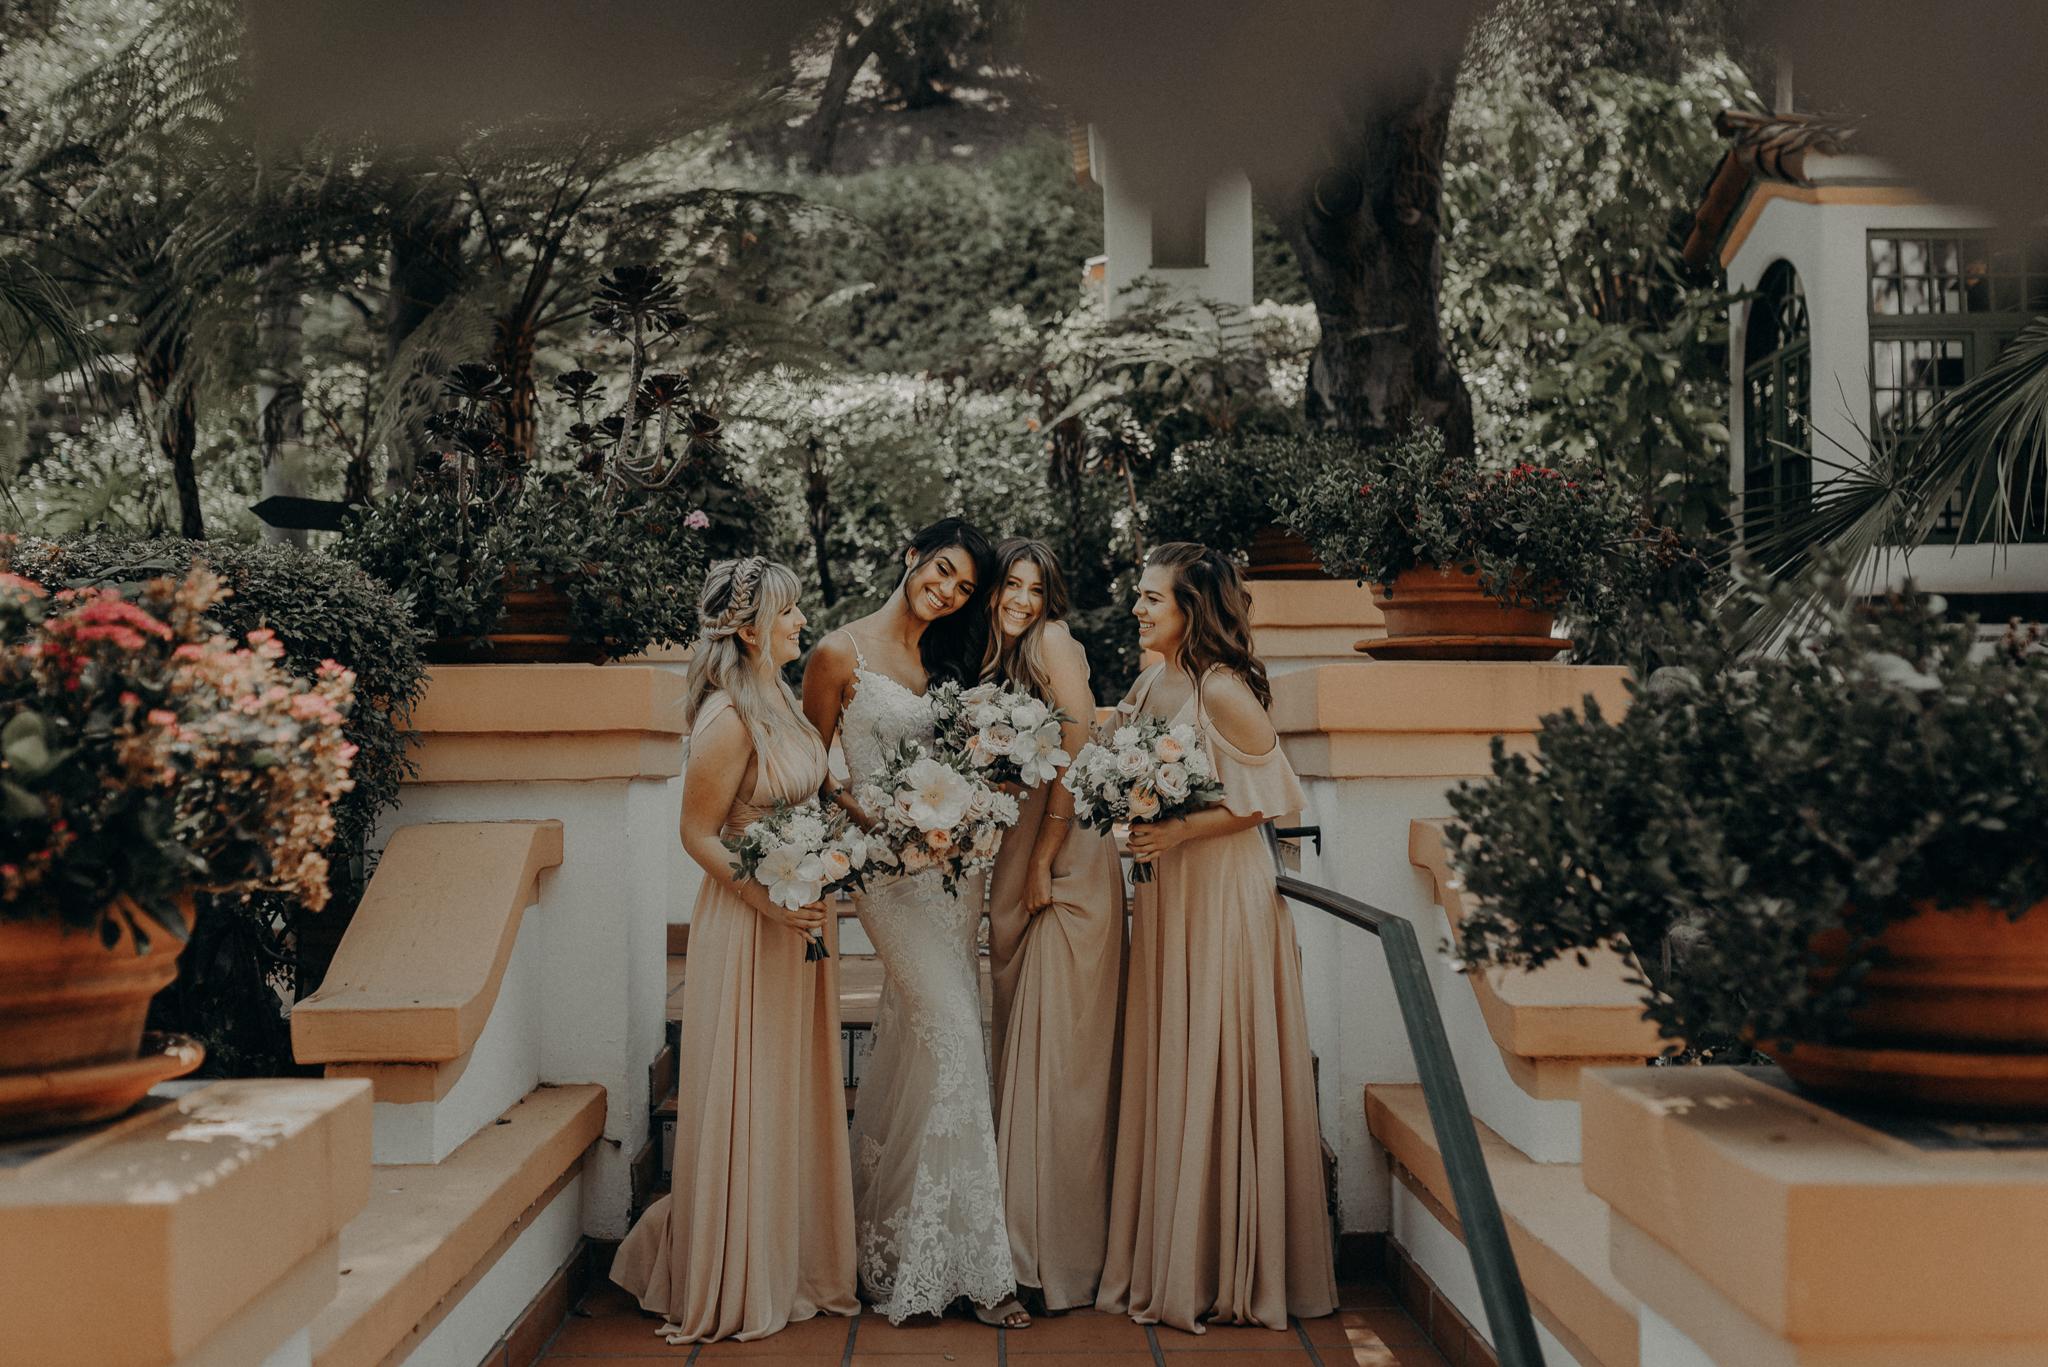 Isaiah + Taylor Photography - Rancho Las Lomas Wedding, Los Angeles Wedding Photographer-039.jpg